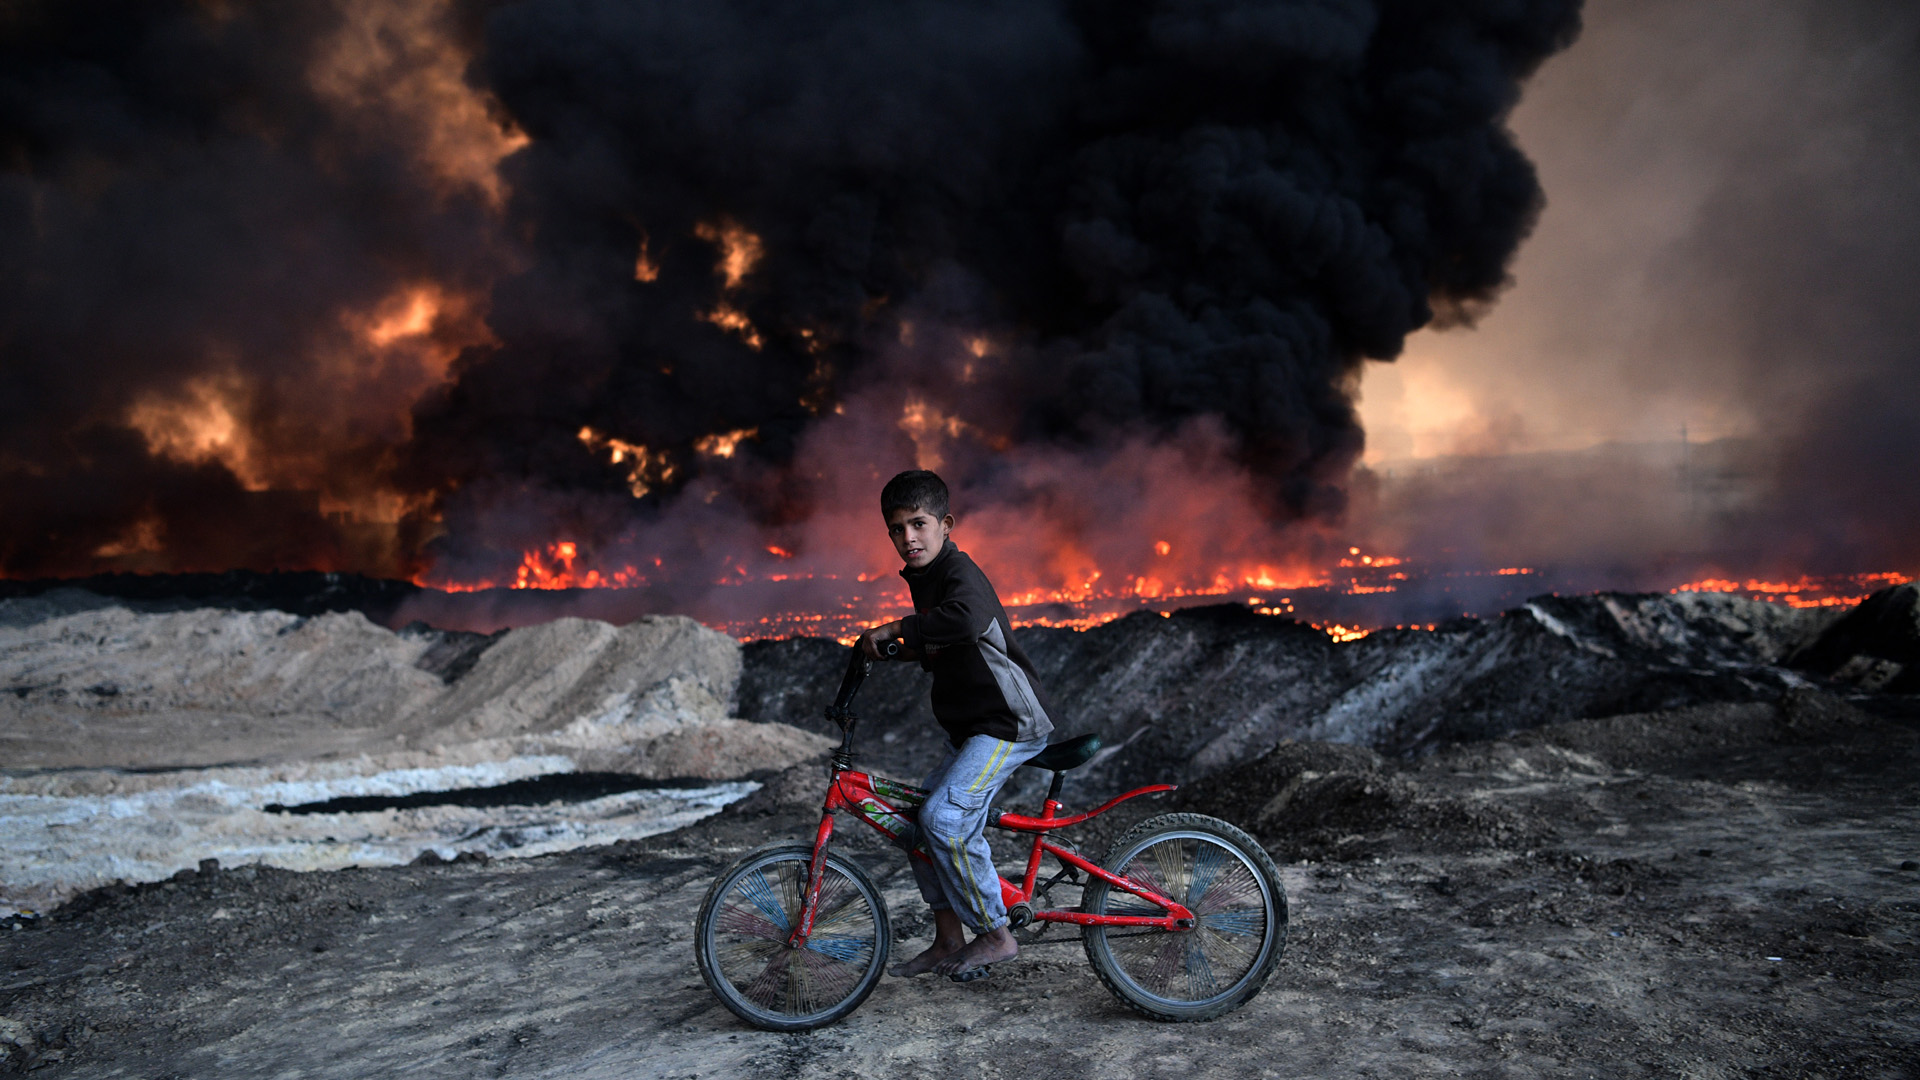 mosul bike oil field20098307-159532